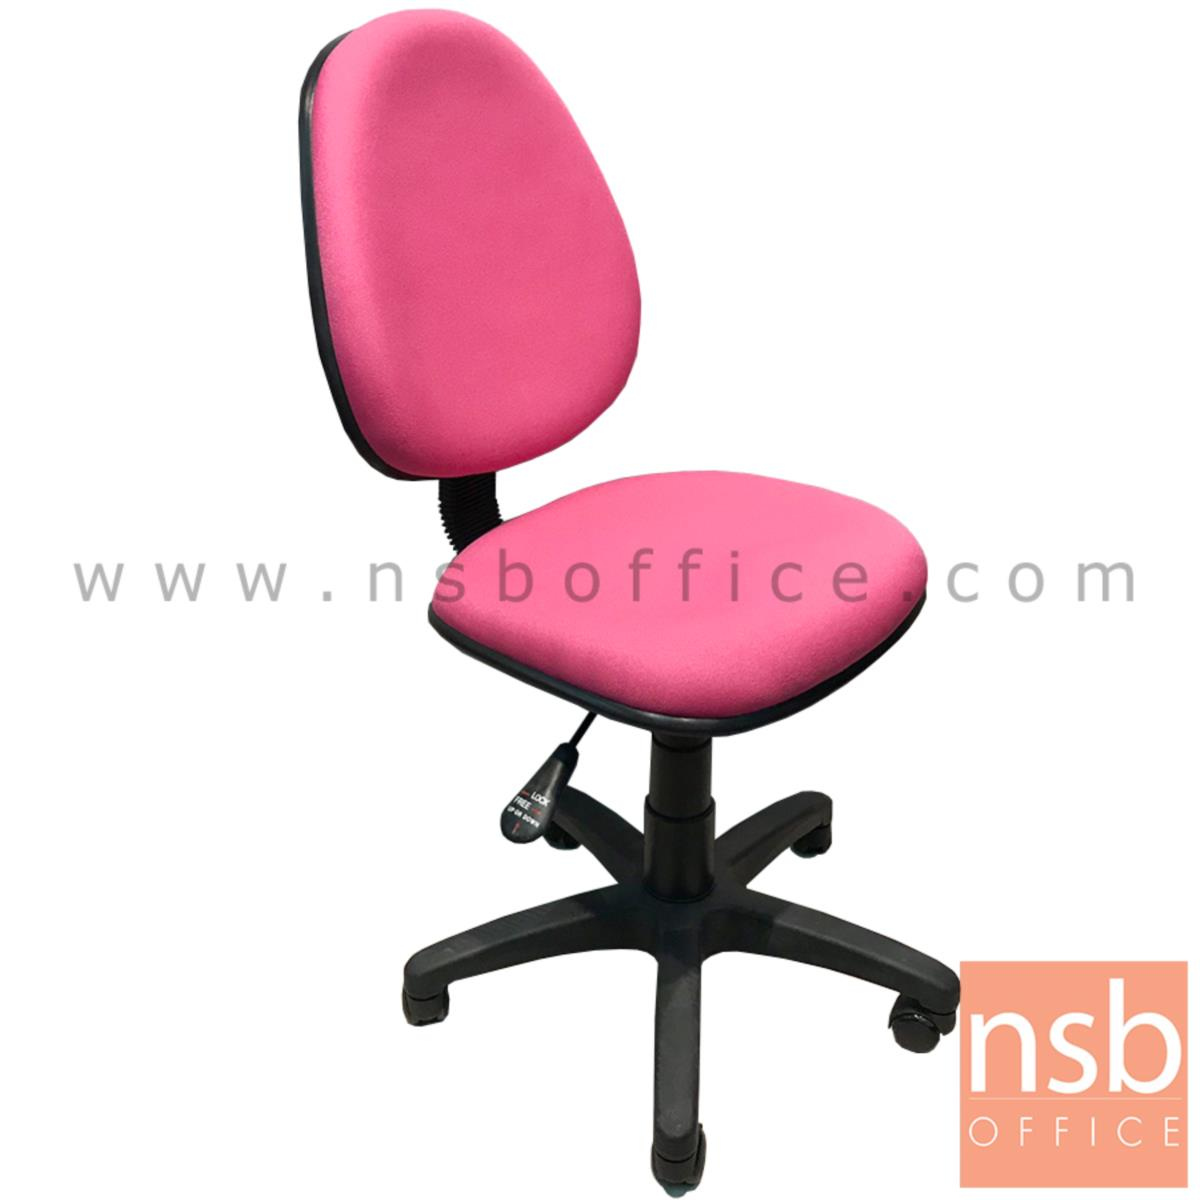 B03A483:เก้าอี้สำนักงาน รุ่น Woves ปรับระดับด้วย Gas Lift